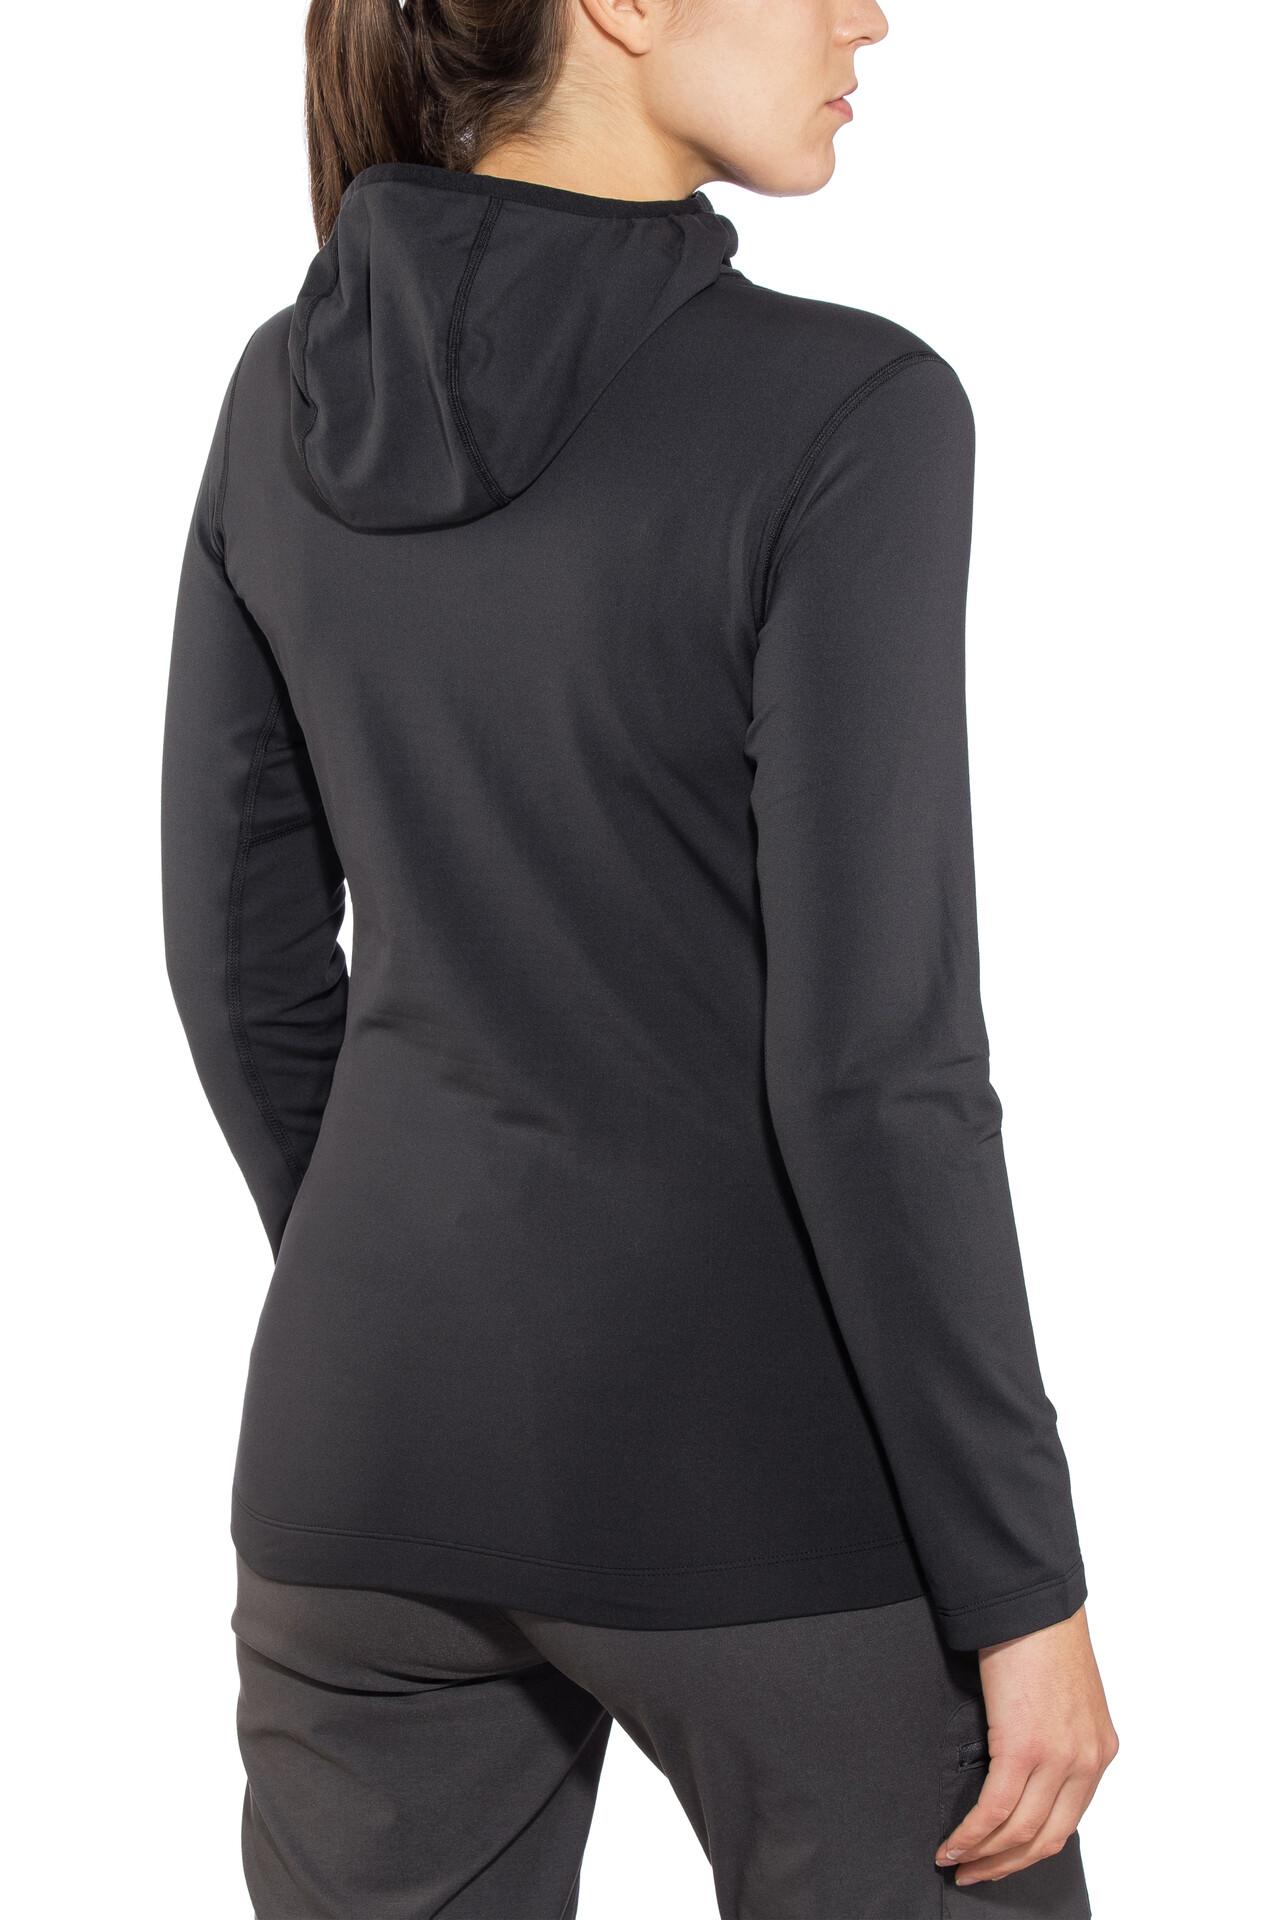 T Noir Lt Shirt Arc'teryx Femme Rho Longues Manches XZPuki